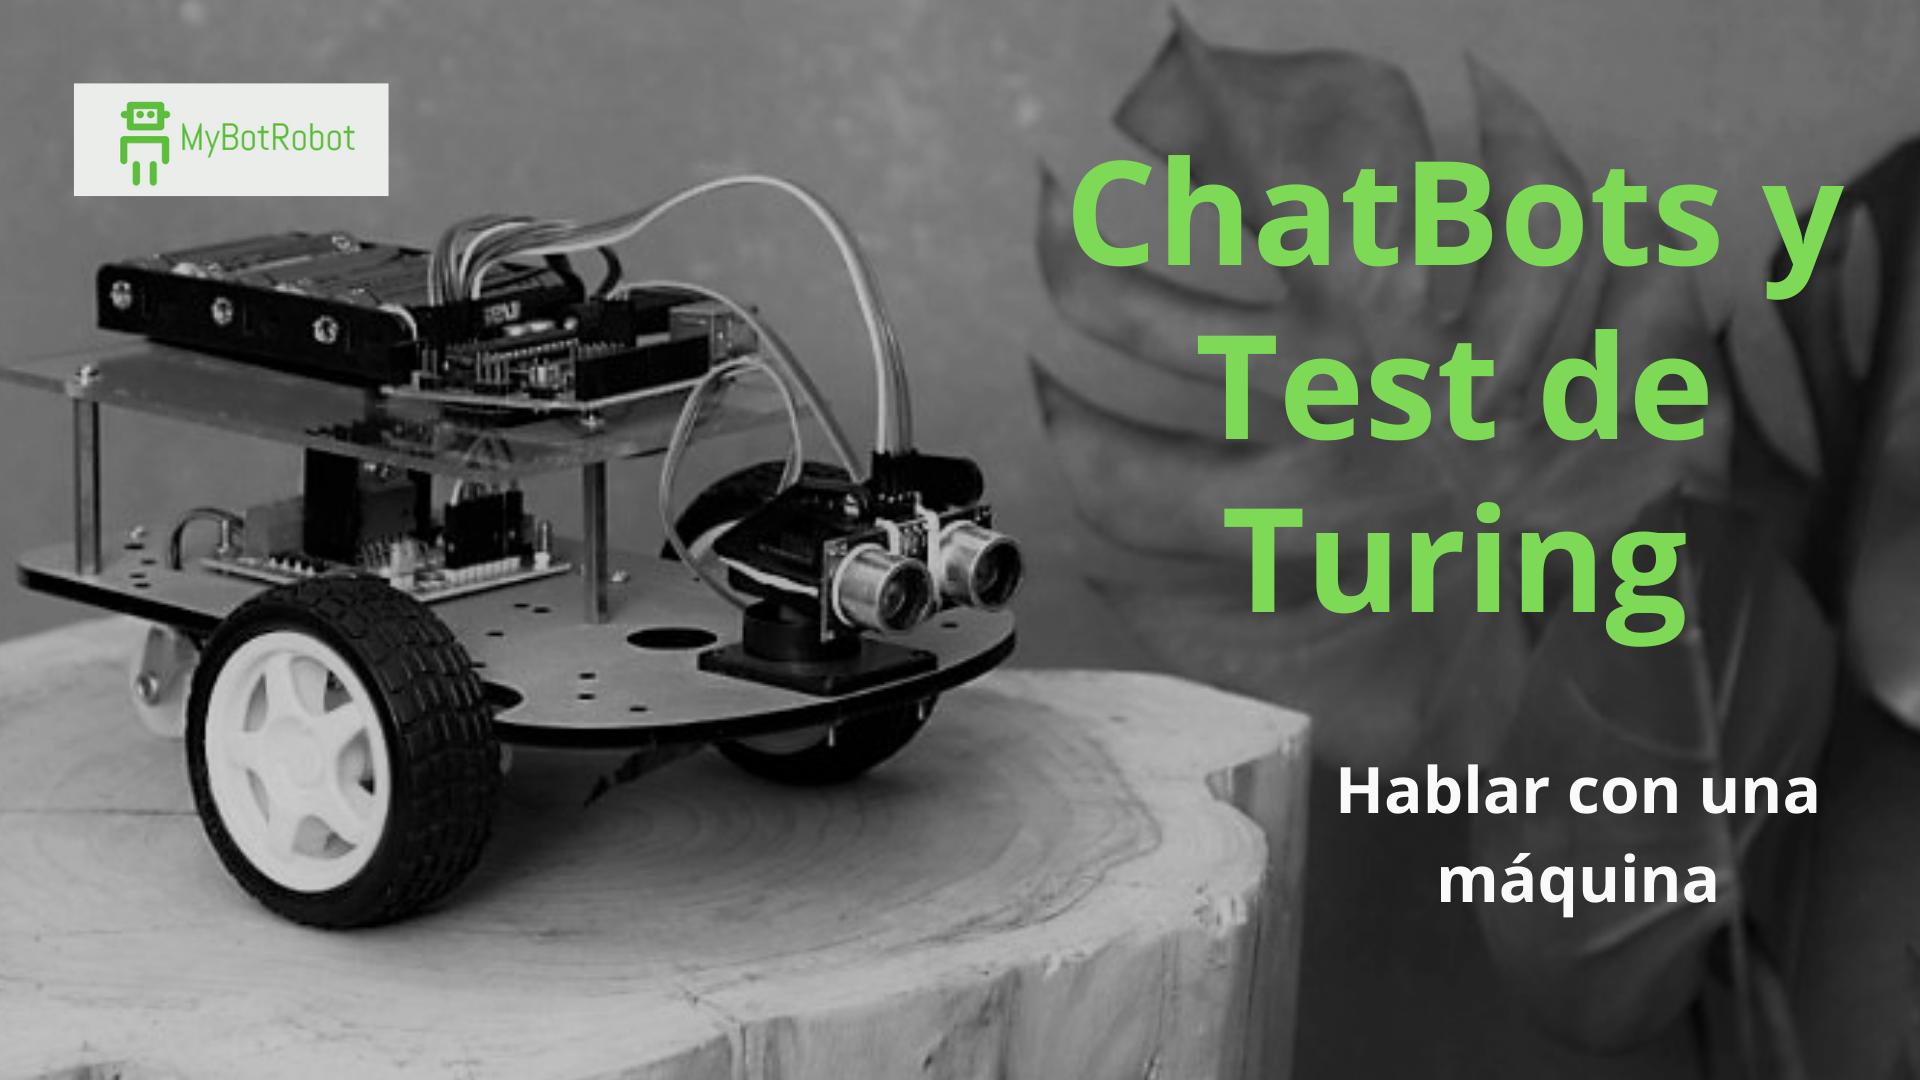 Imagen del post de la web MyBotRobot sobre bot conversacional y test de turing